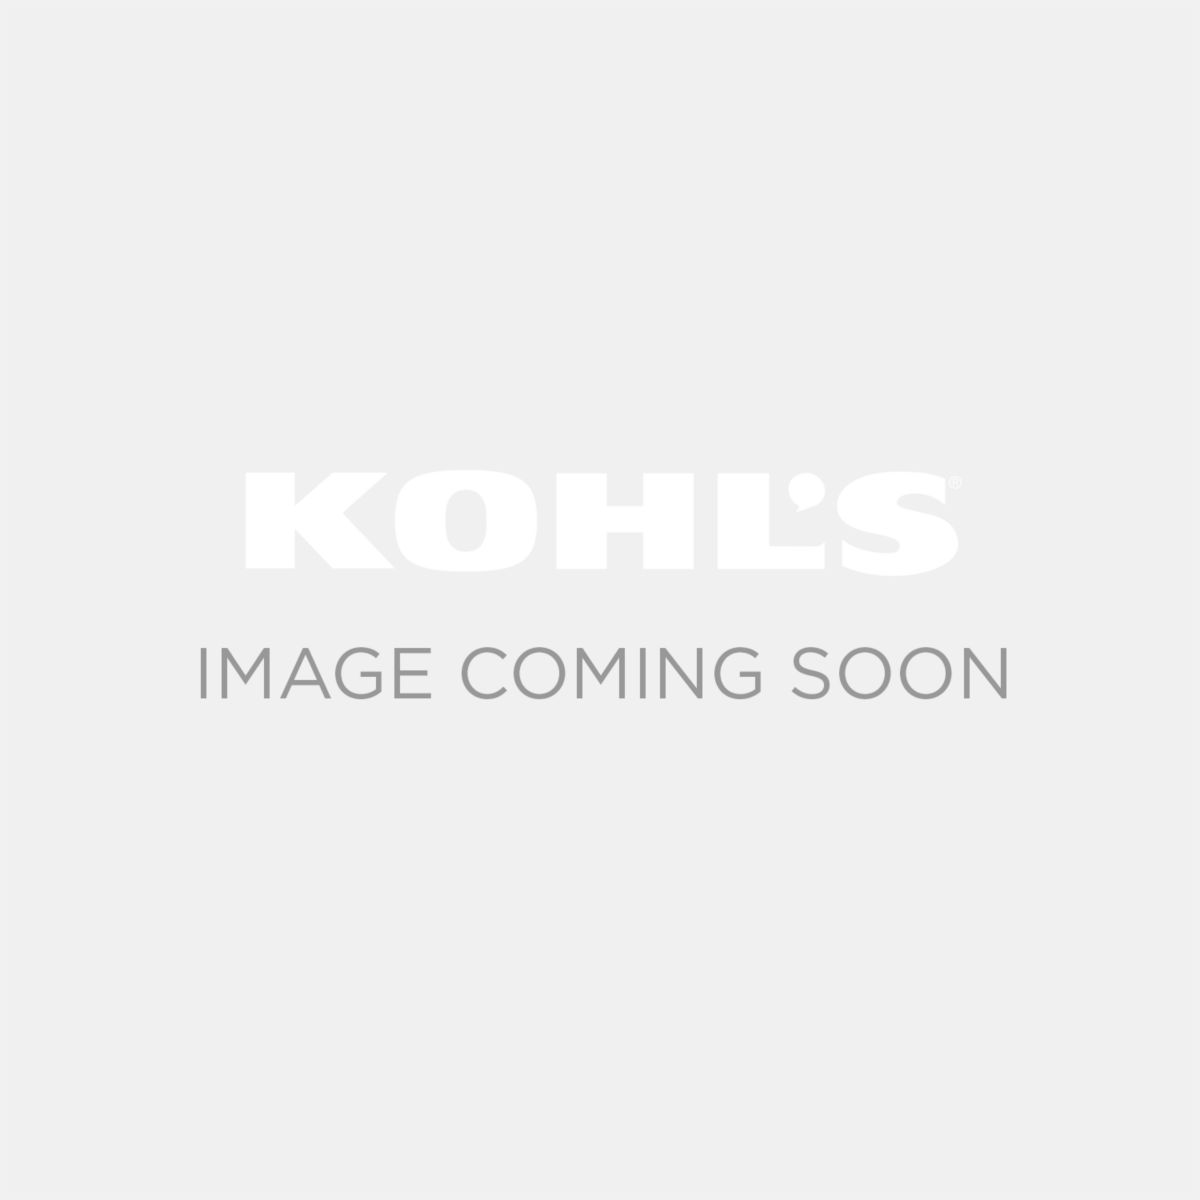 Skechers® Reggae Staycation Slim Women's Sandals 3GNTl